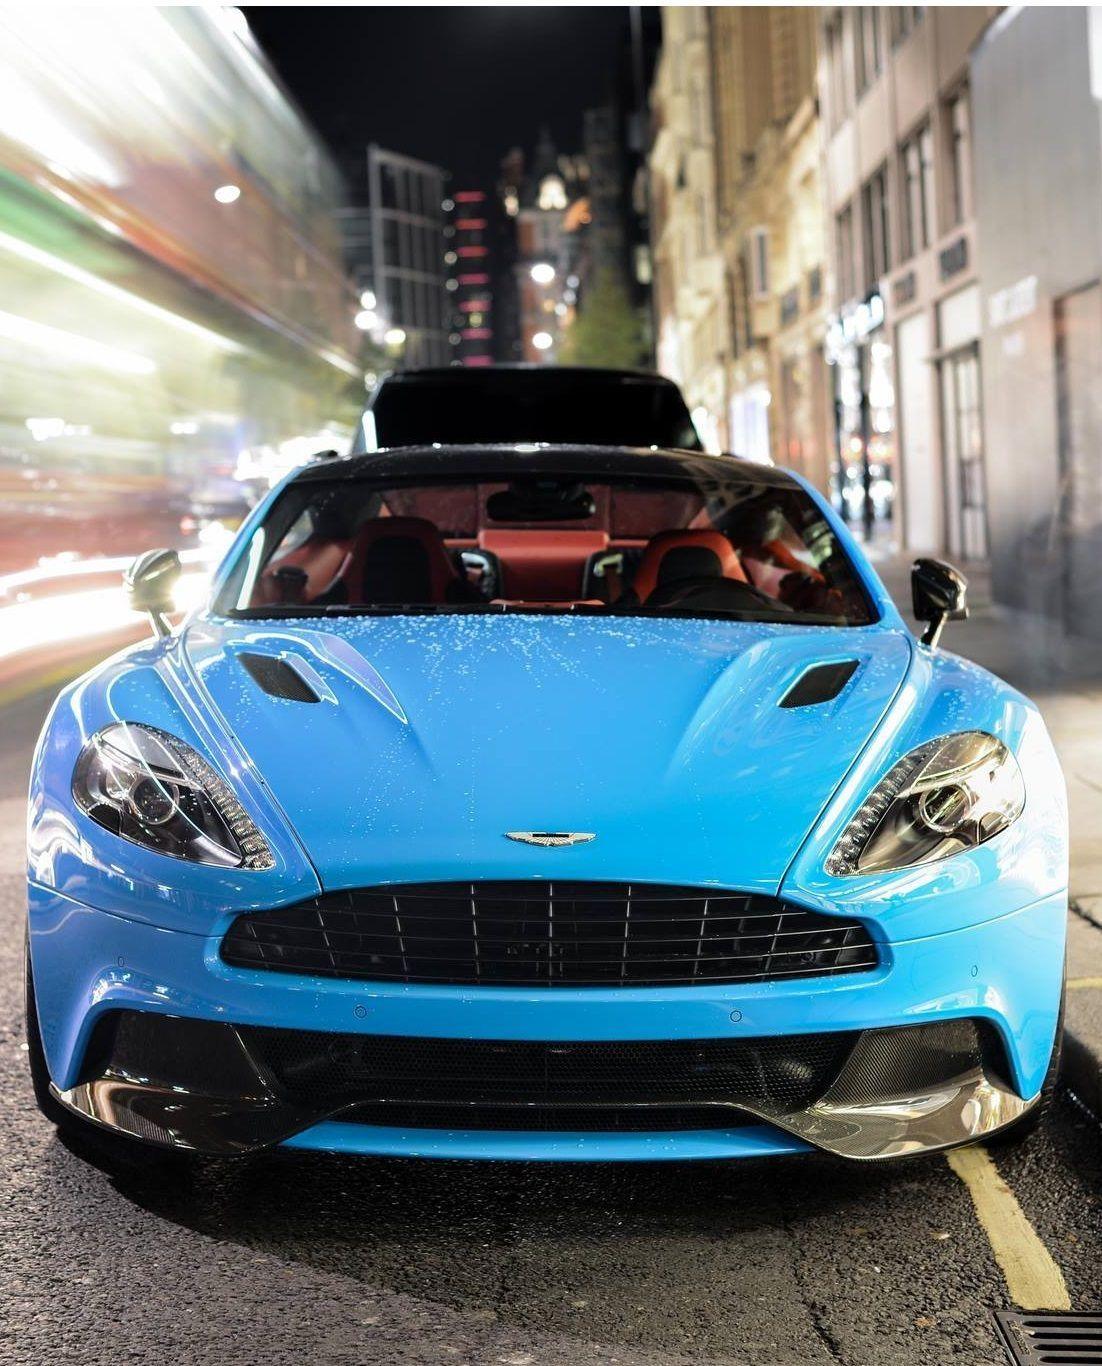 Aston Martin Expensive Cars Super Cars Aston Martin Cars